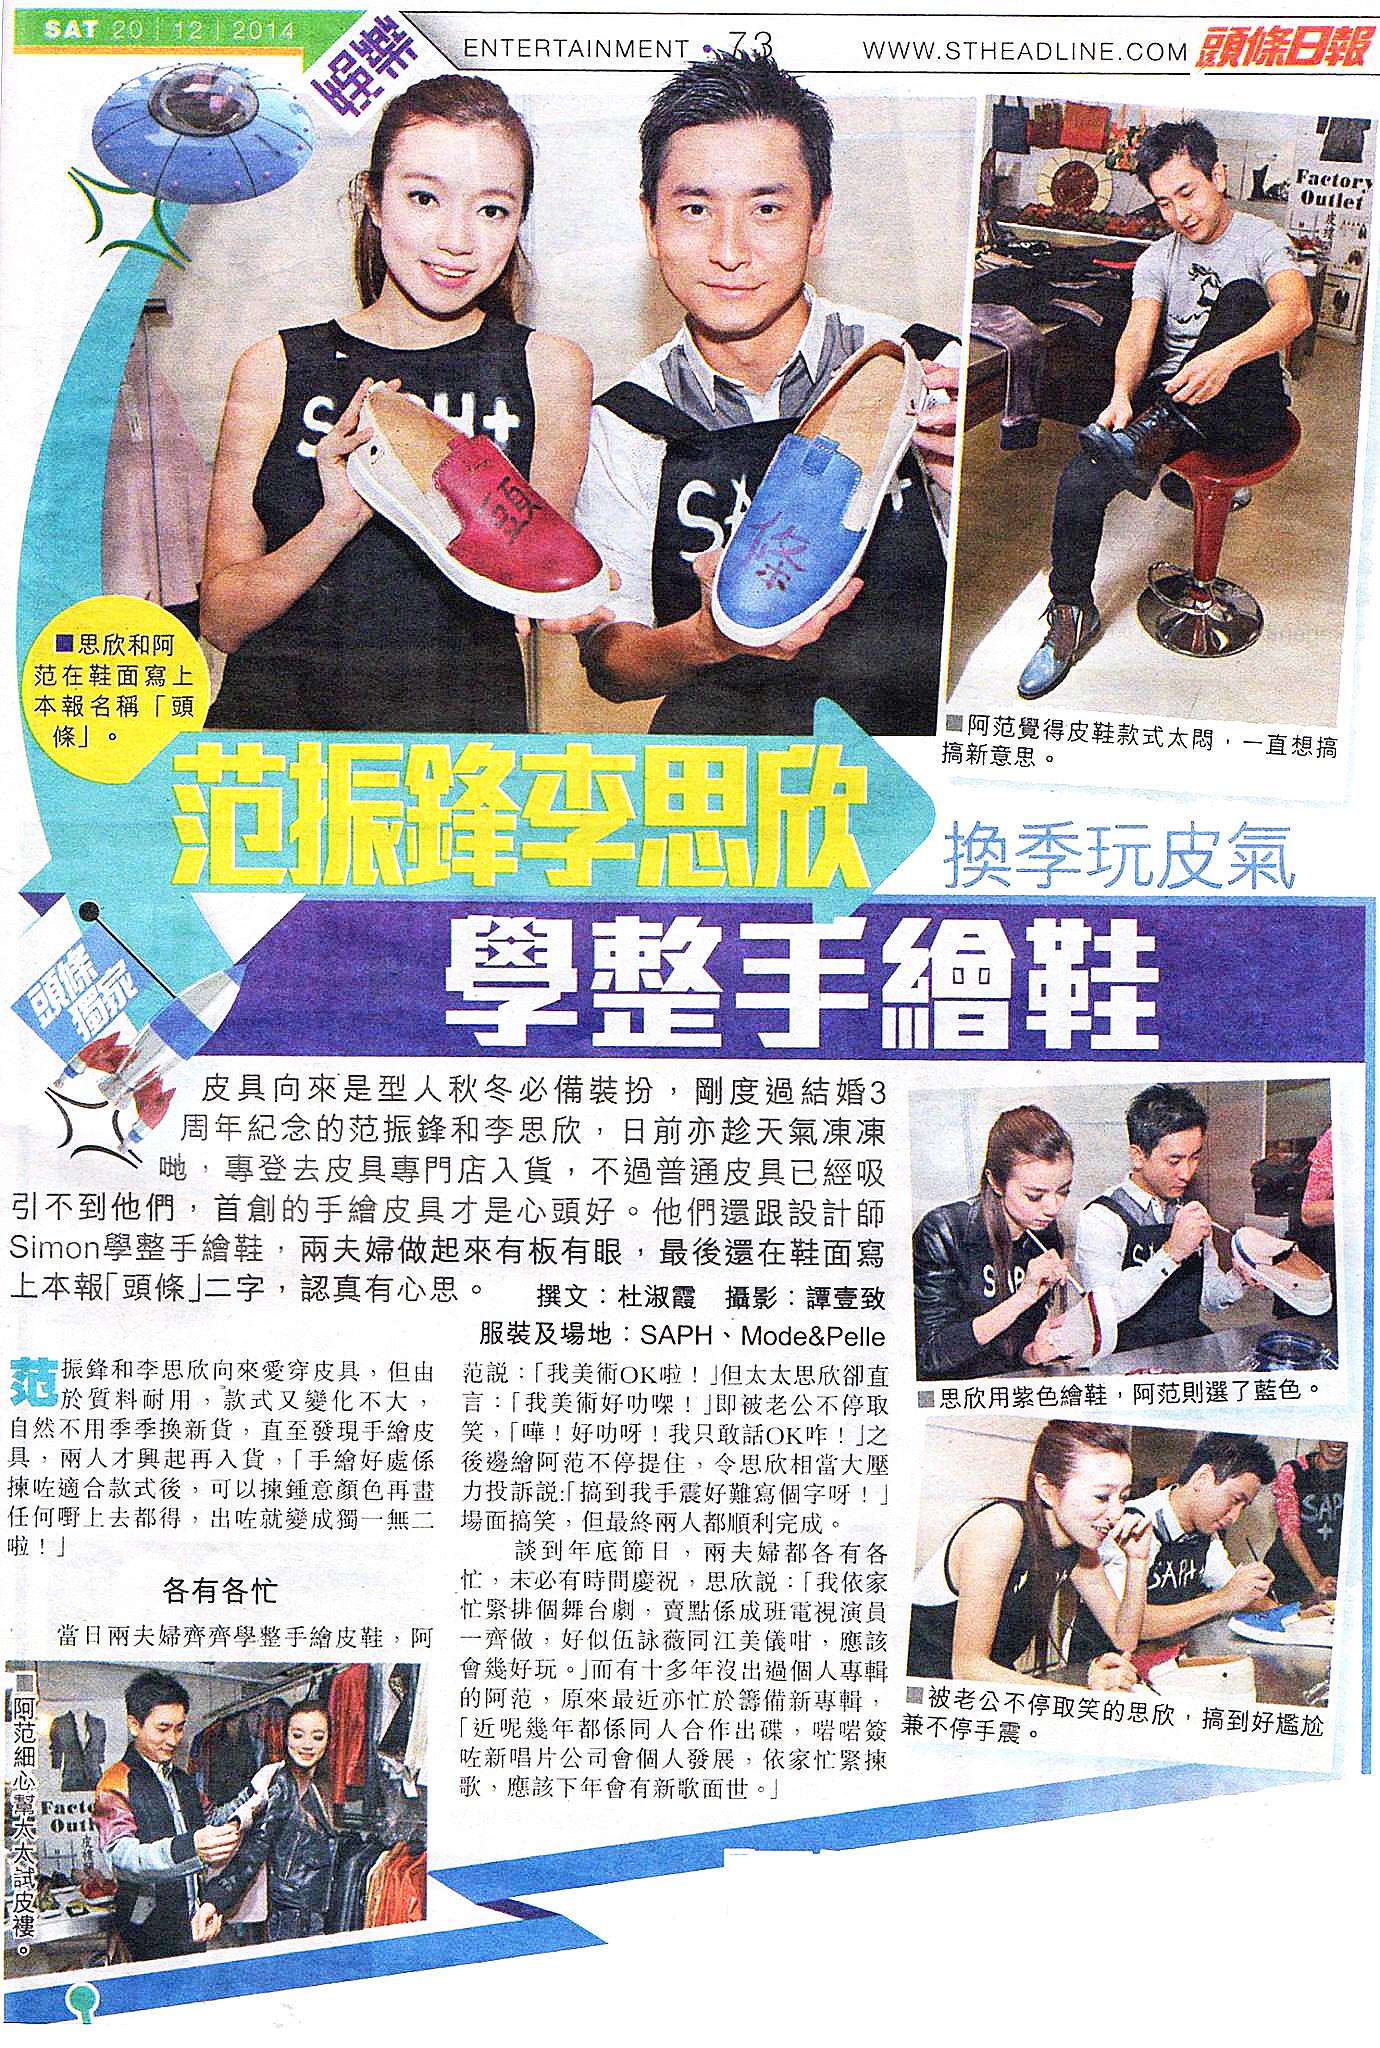 The Headline Newspaper HK